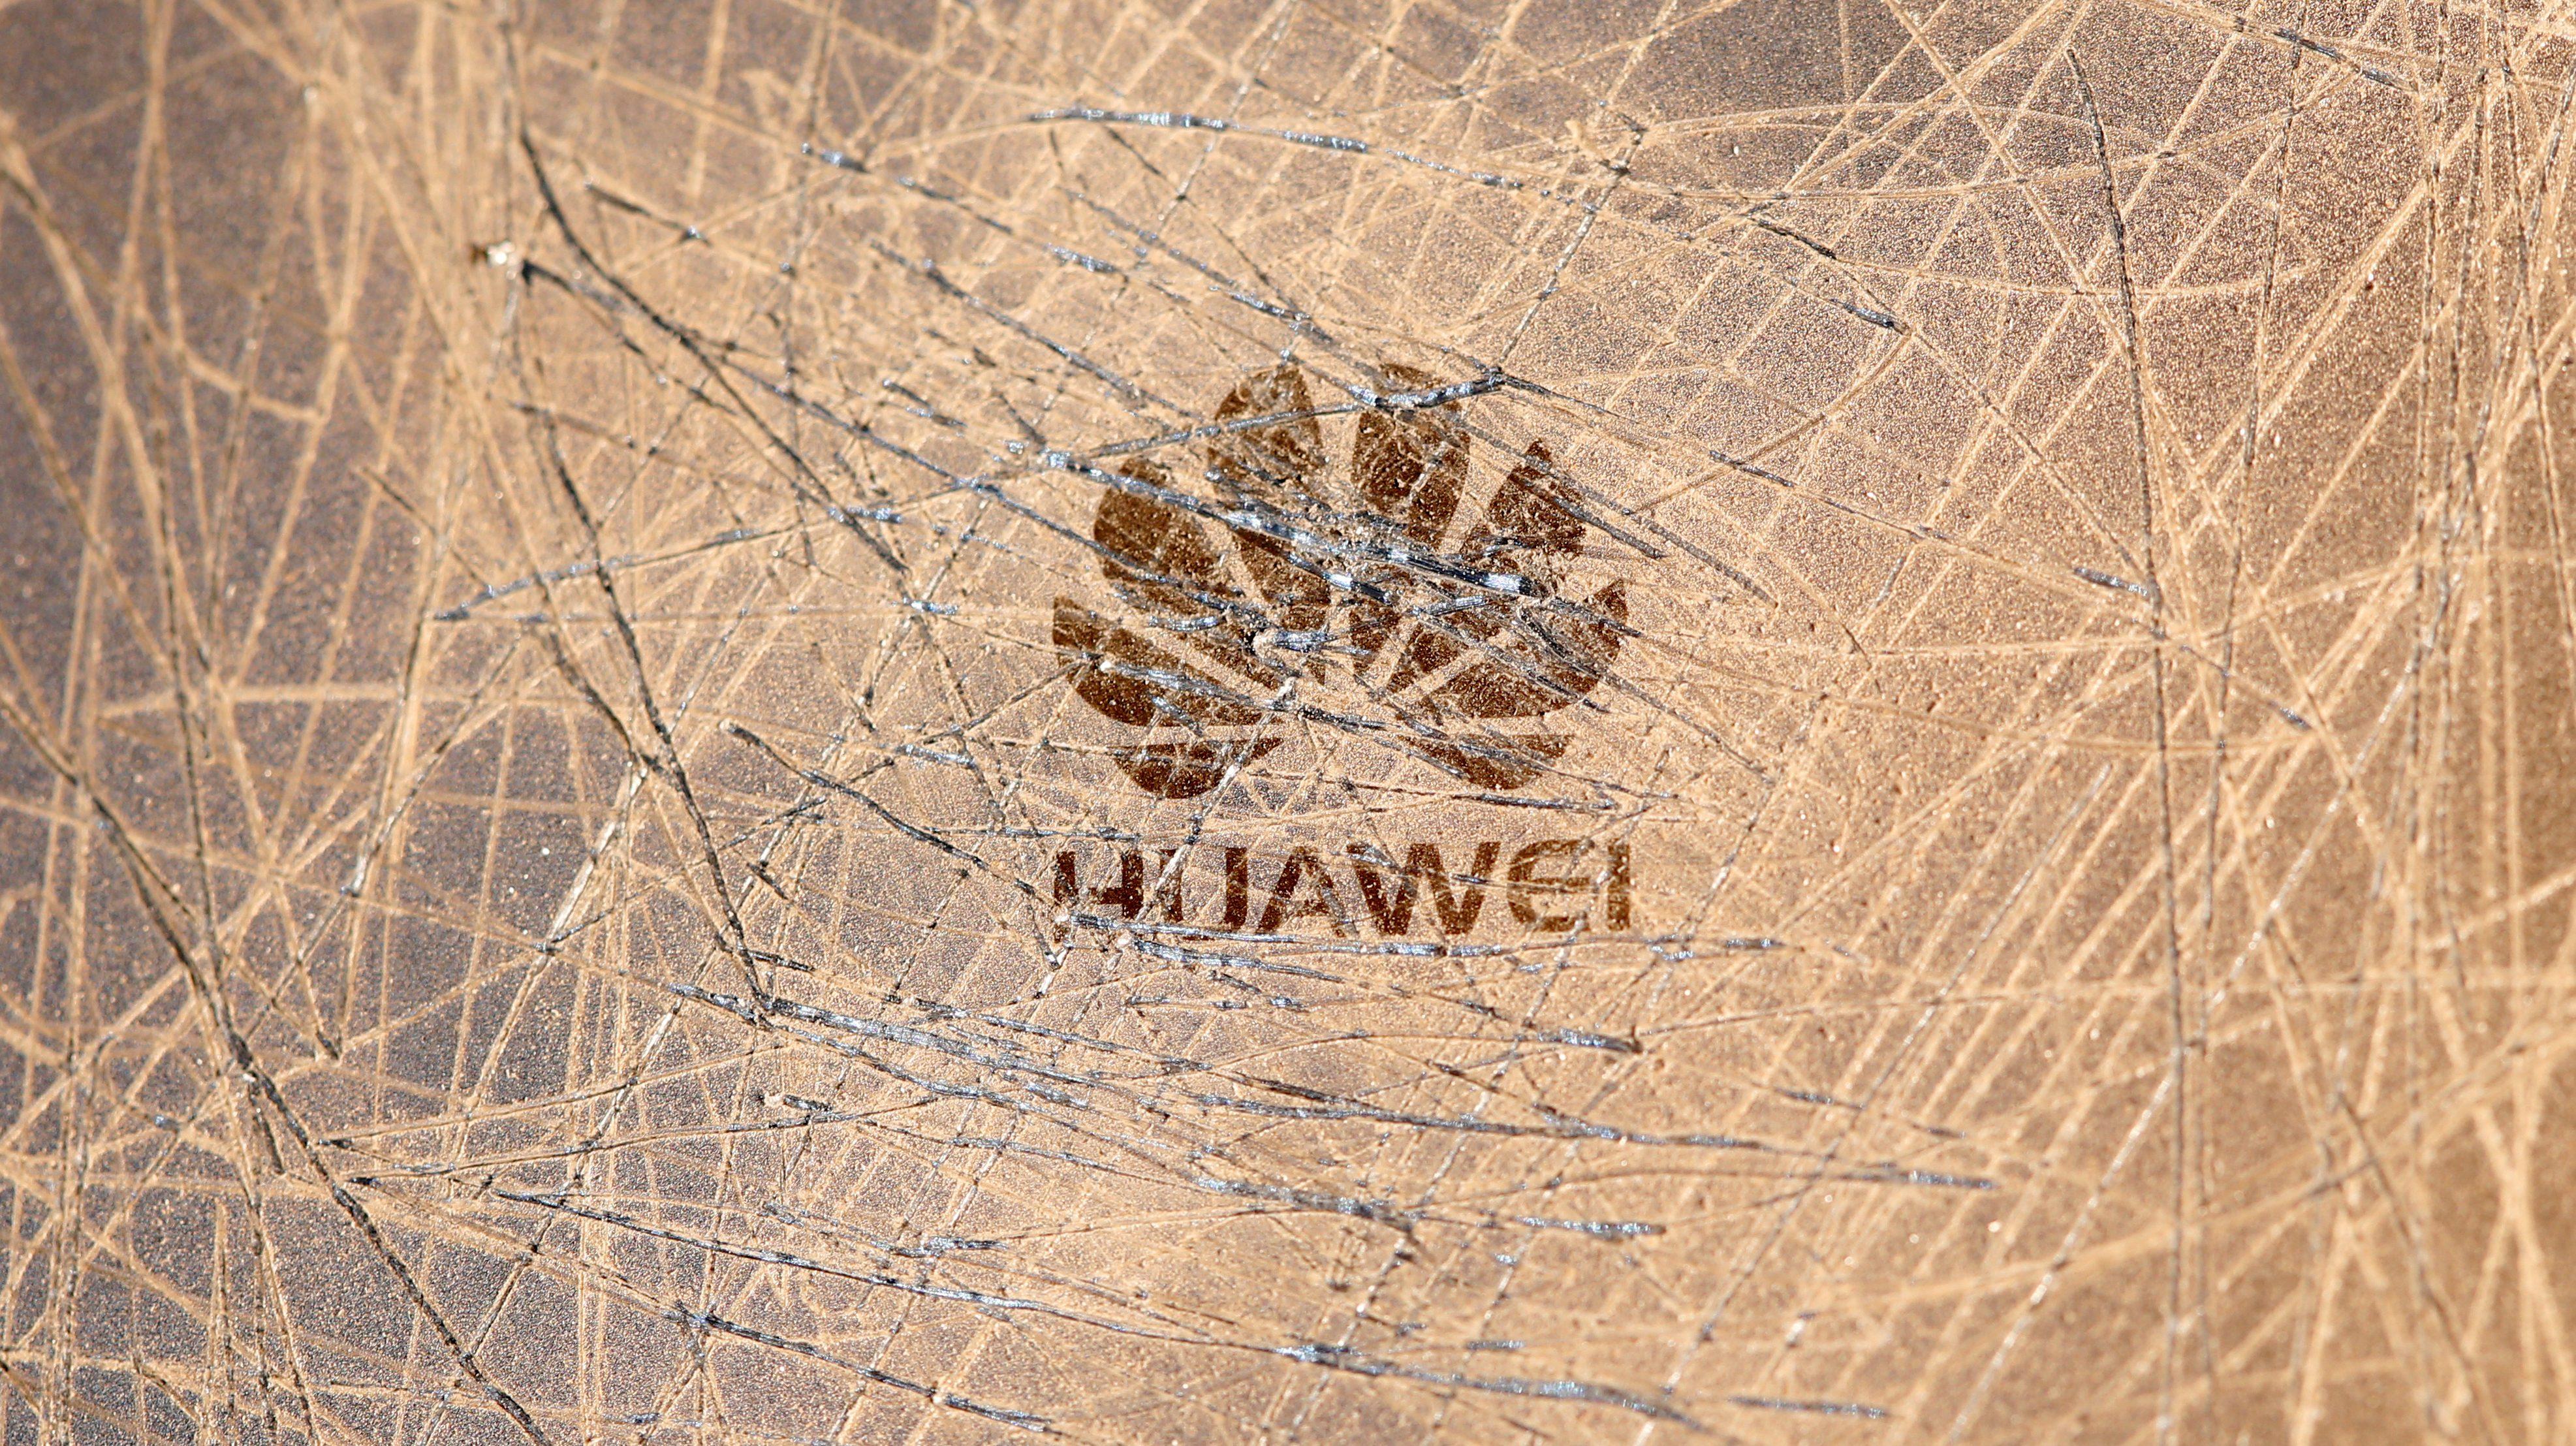 Scratched-up Huawei logo